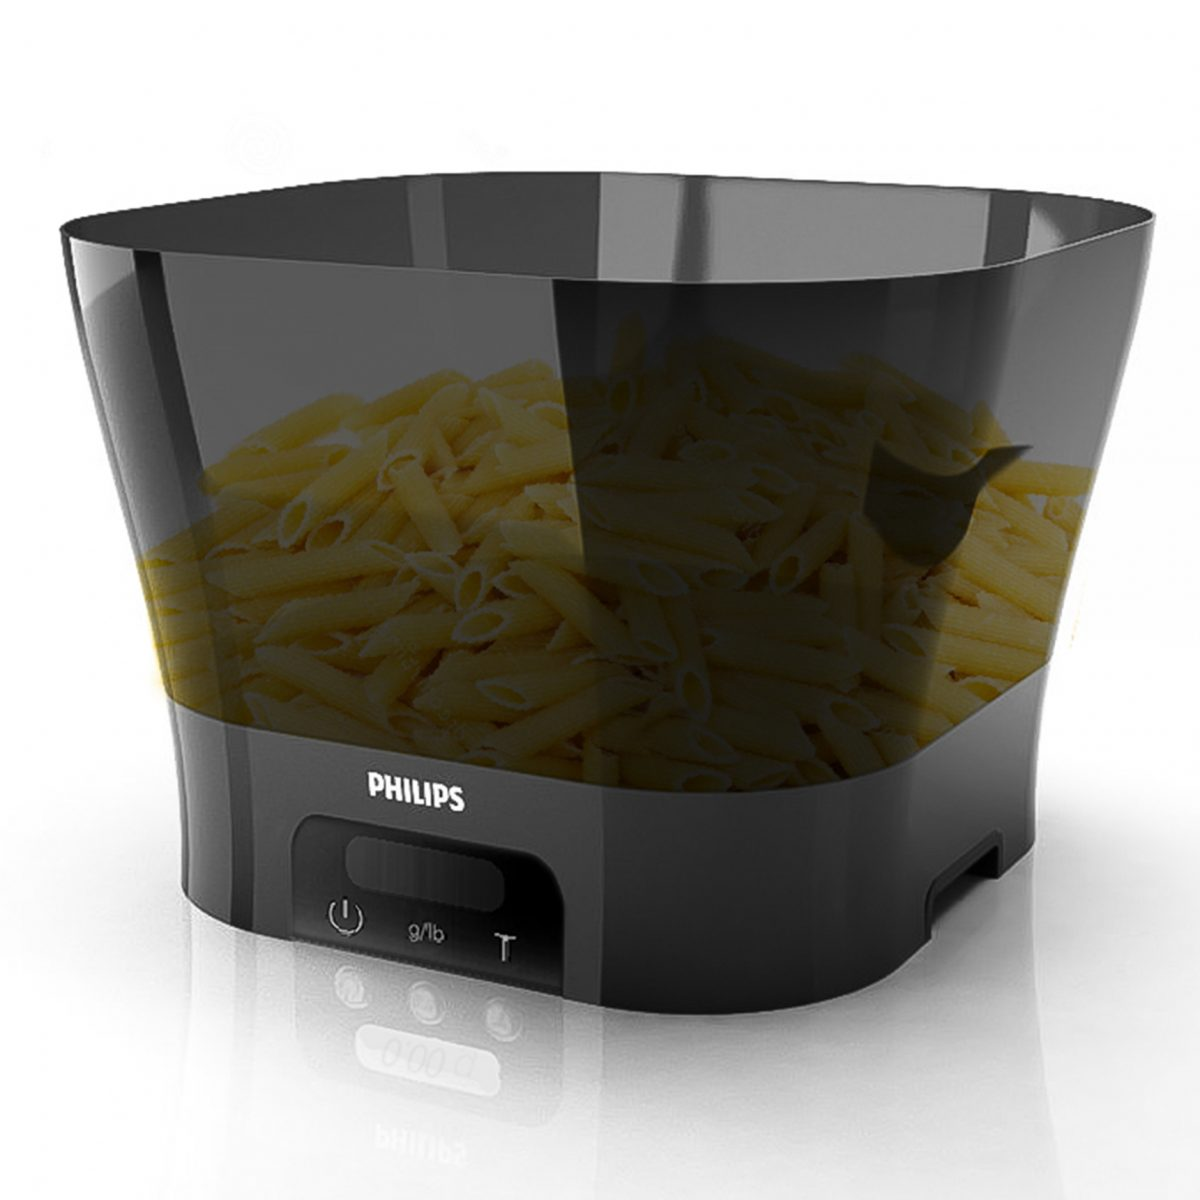 Bilancia cucina philips digitale